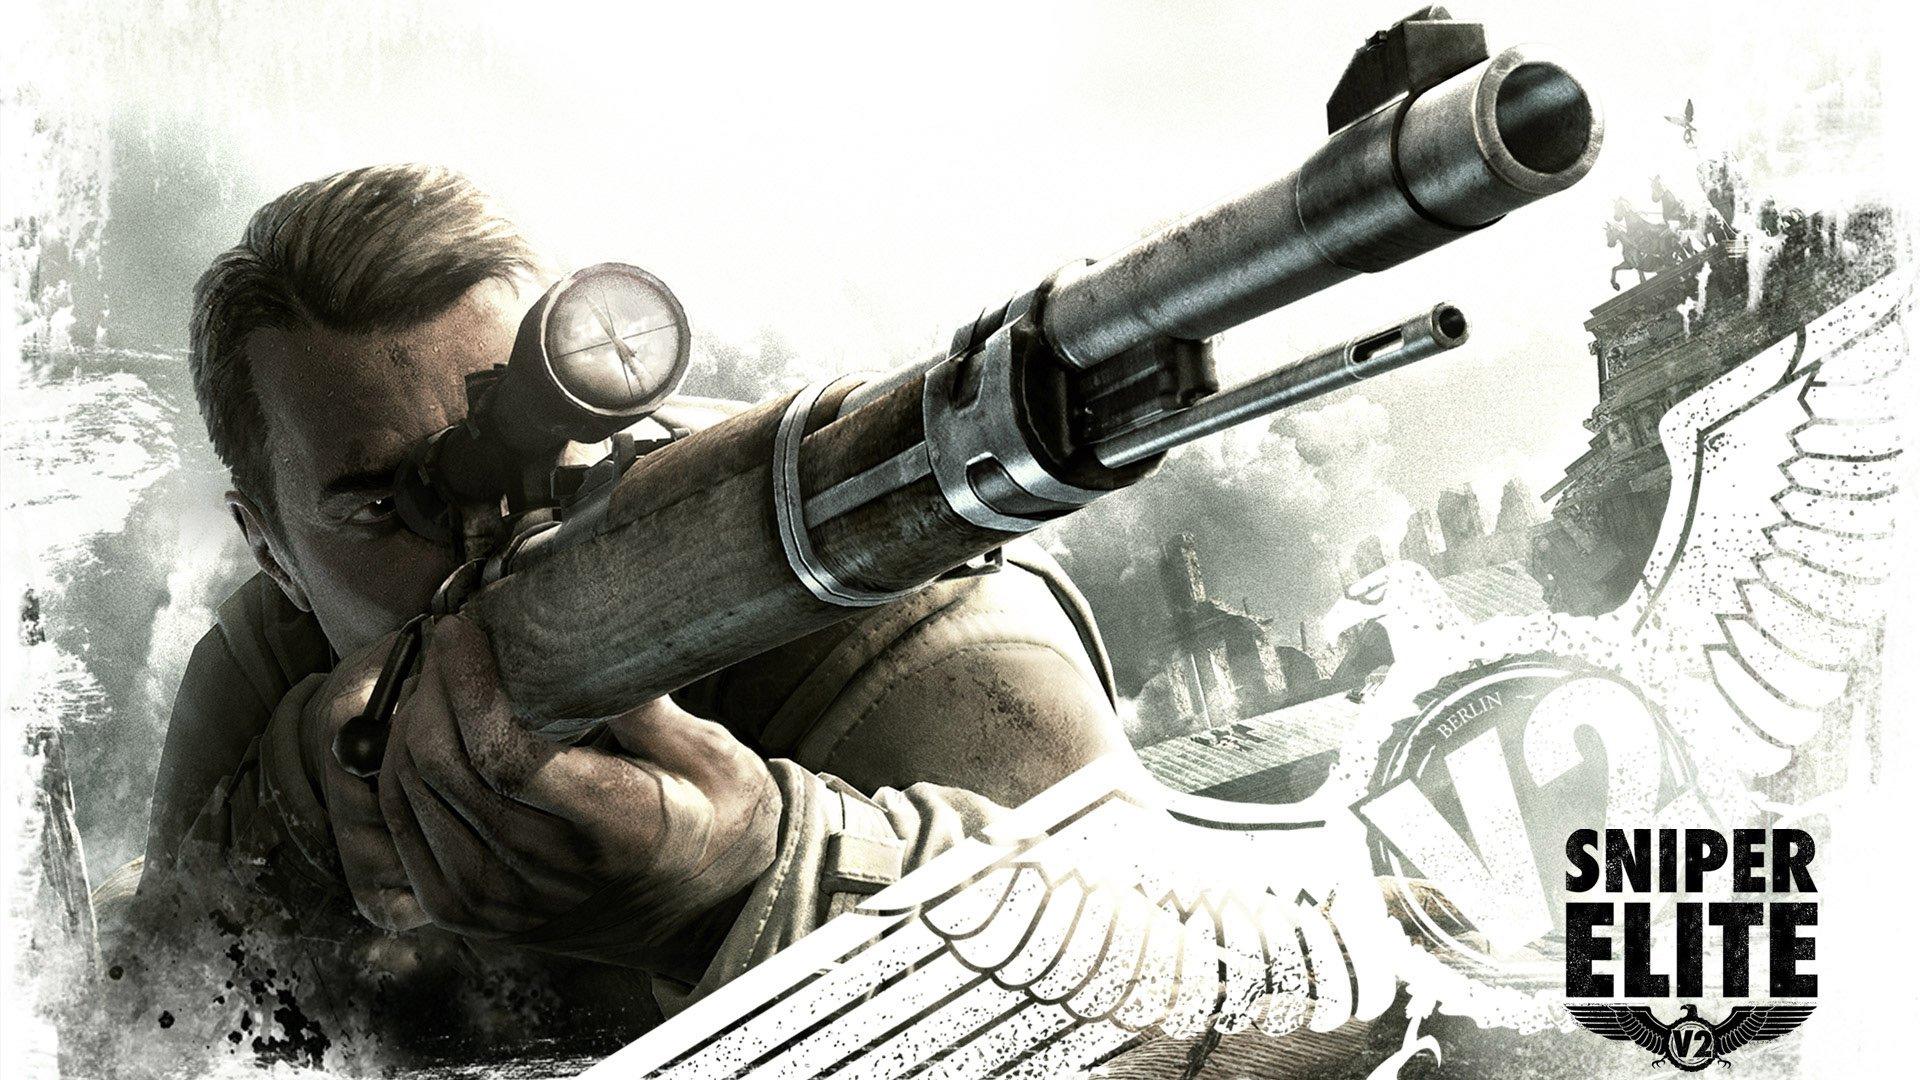 Sniper Elite HD